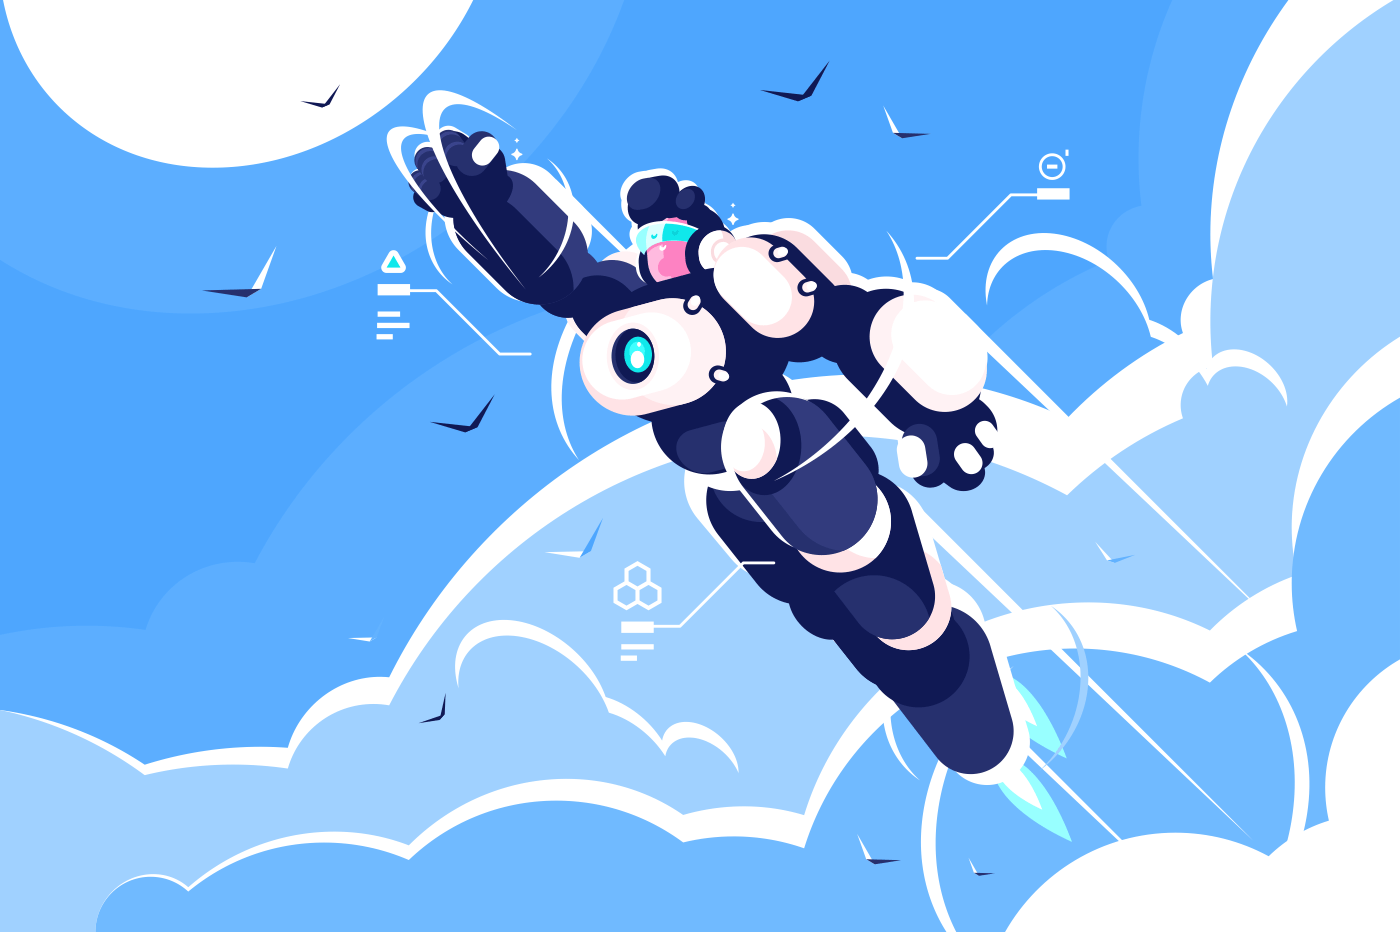 Man astronaut super hero spacesuit flying in sky. Robot costume powerful cartoon character concept. Flat. Vector illustration.